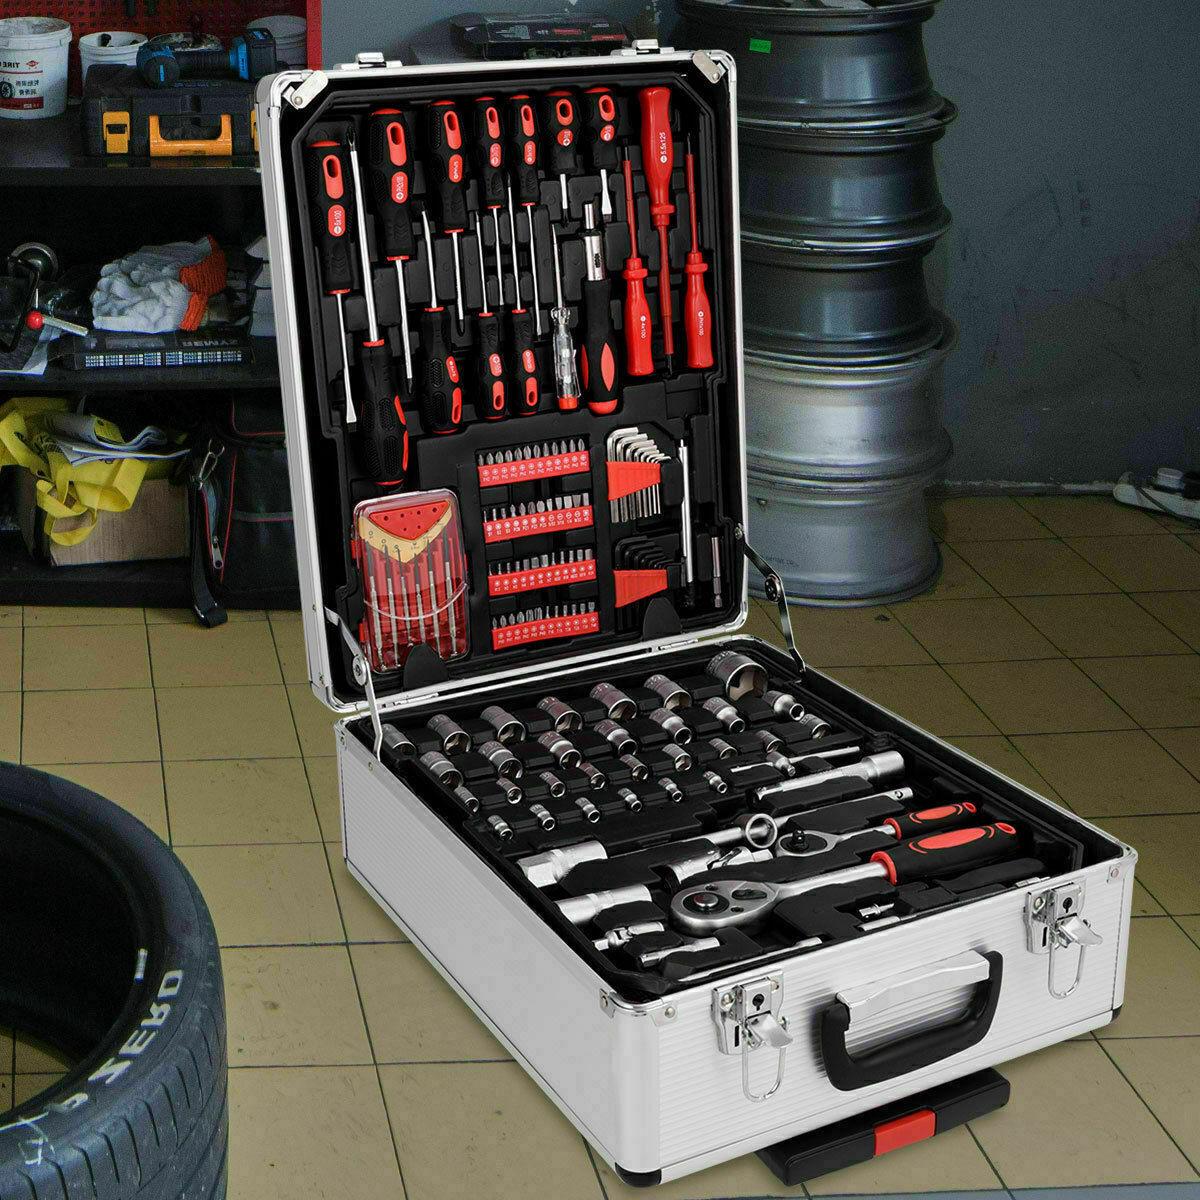 585 PCS Hand Tool Set Mechanics Kit Wrenches Socket Toolbox Trolley Case Castors